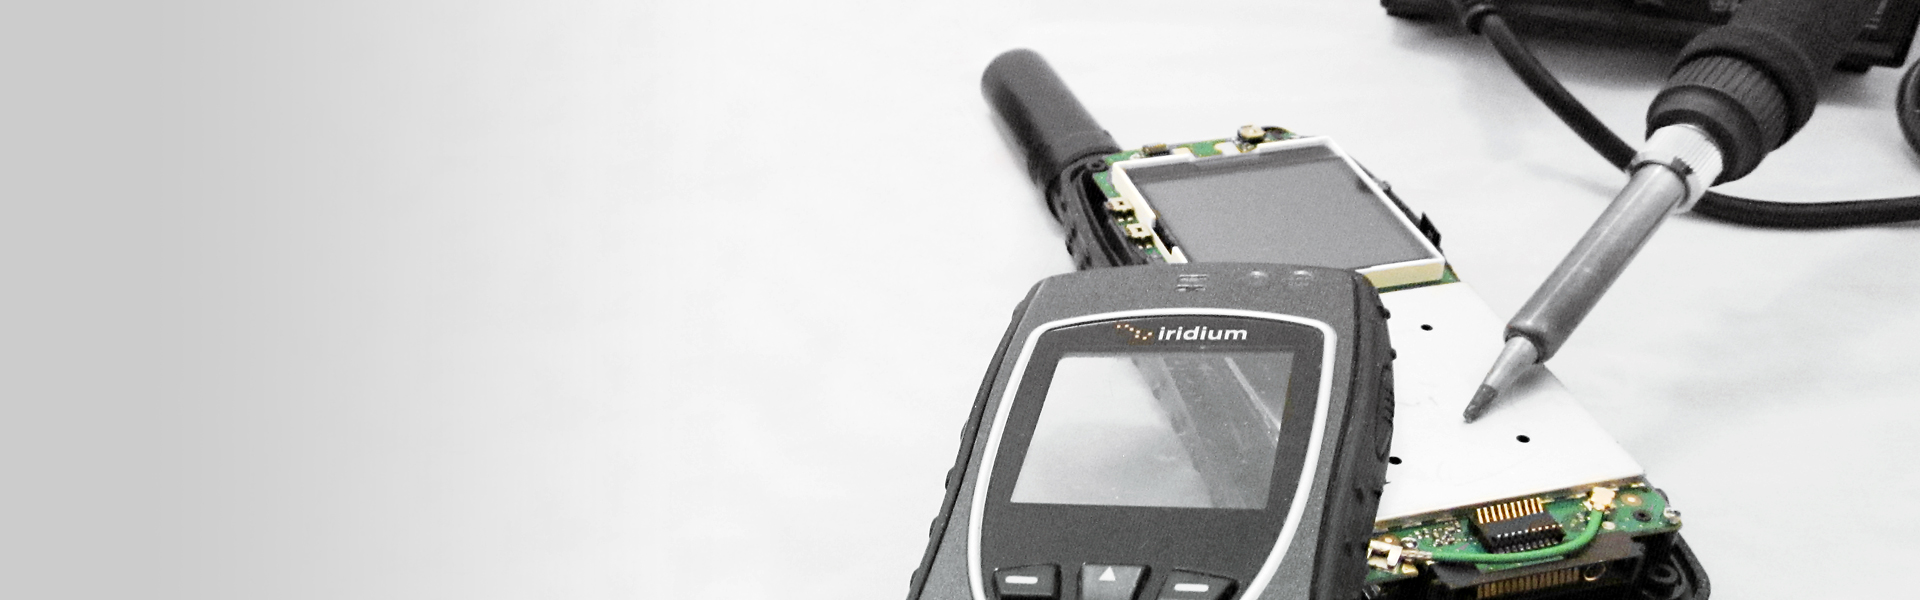 NorthernAxcess iridium satellite phone repair center